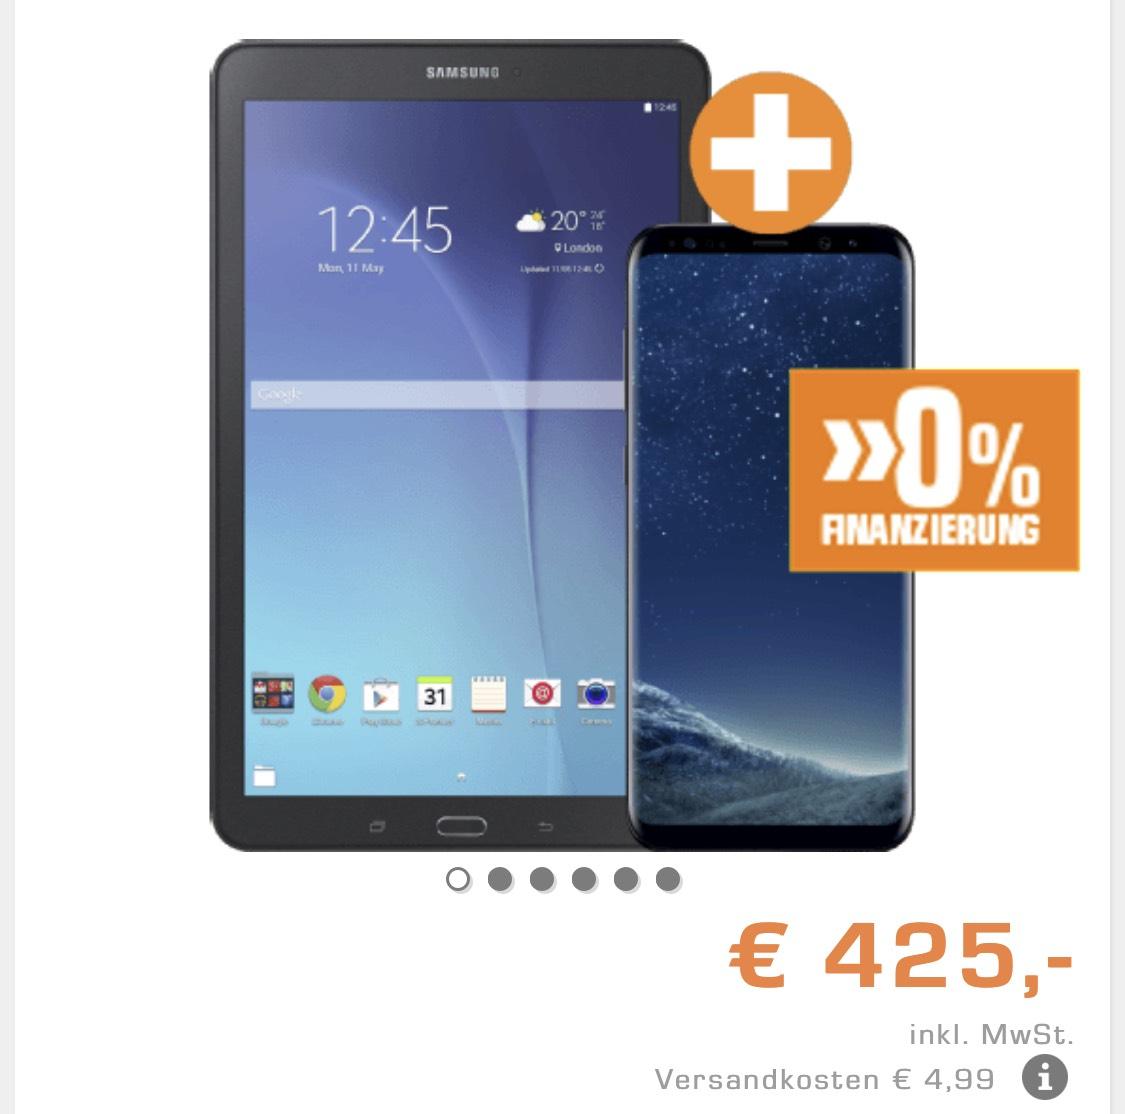 Samsung Galaxy S8 Plus 64GB - Midnight Black + SAMSUNG Galaxy Tab E 9.6 Zoll Wifi, schwarz zsmmn 425€